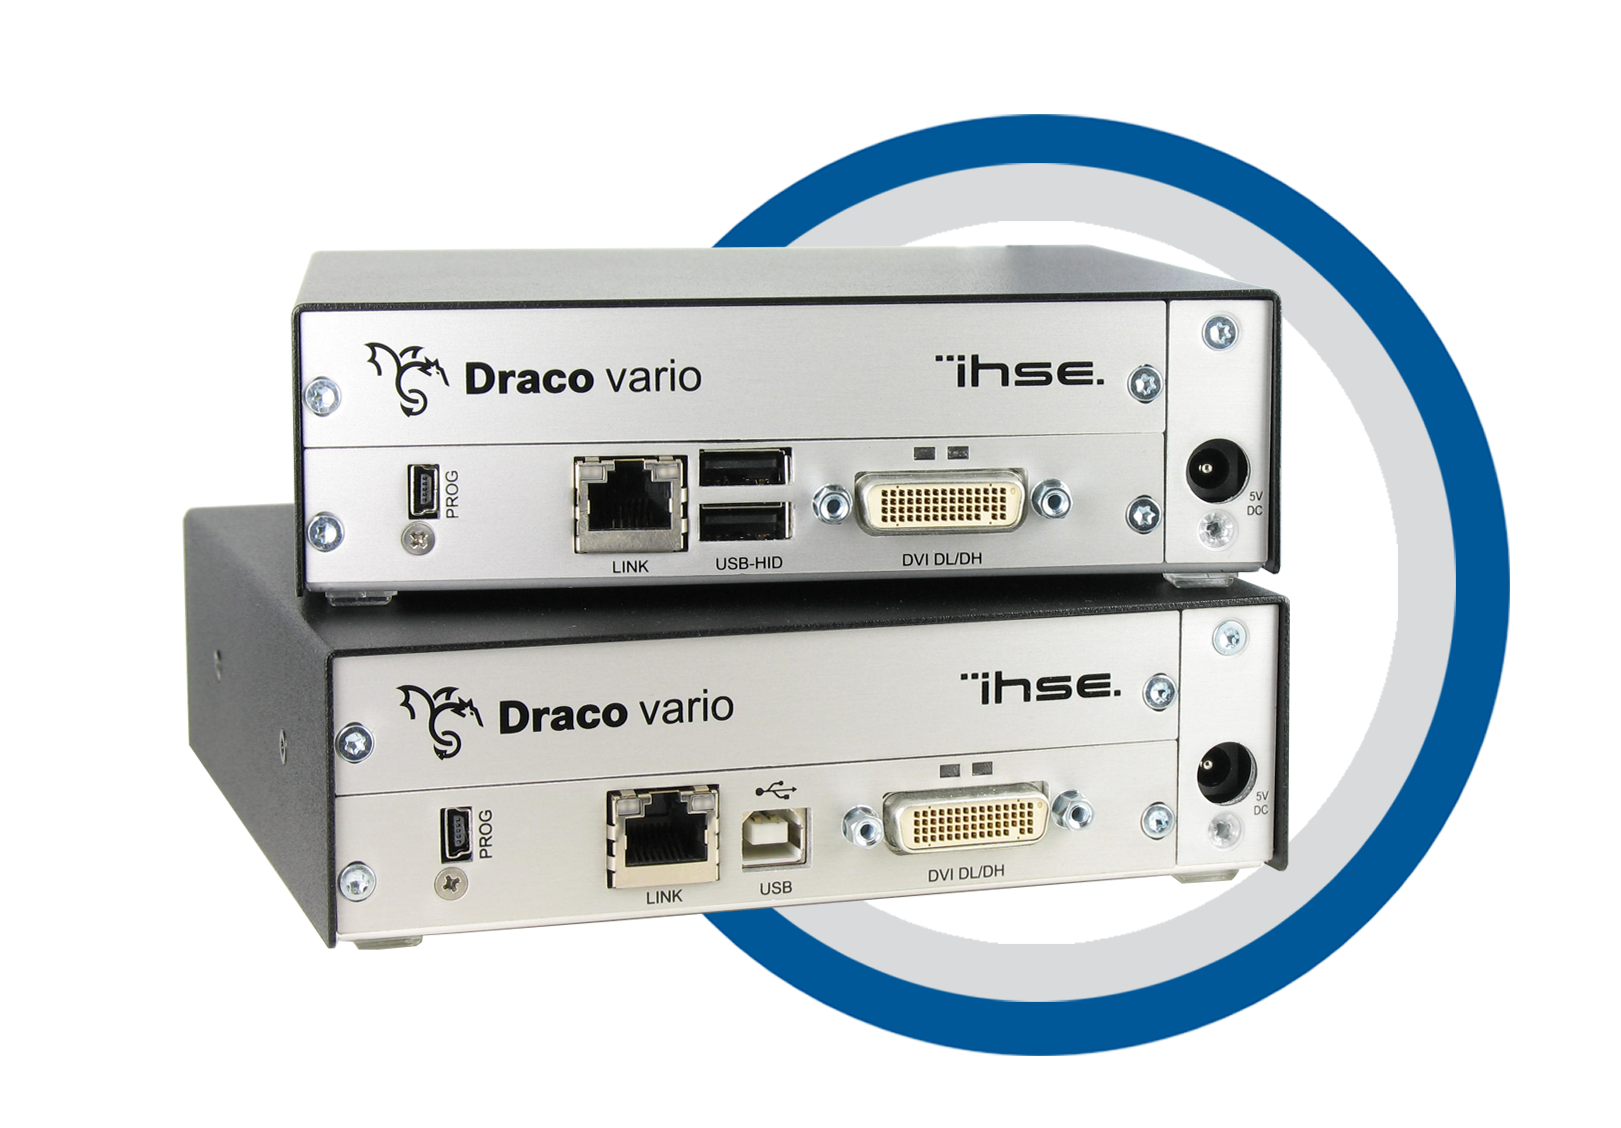 ihse Draco vario Dual-Head / Dual Link